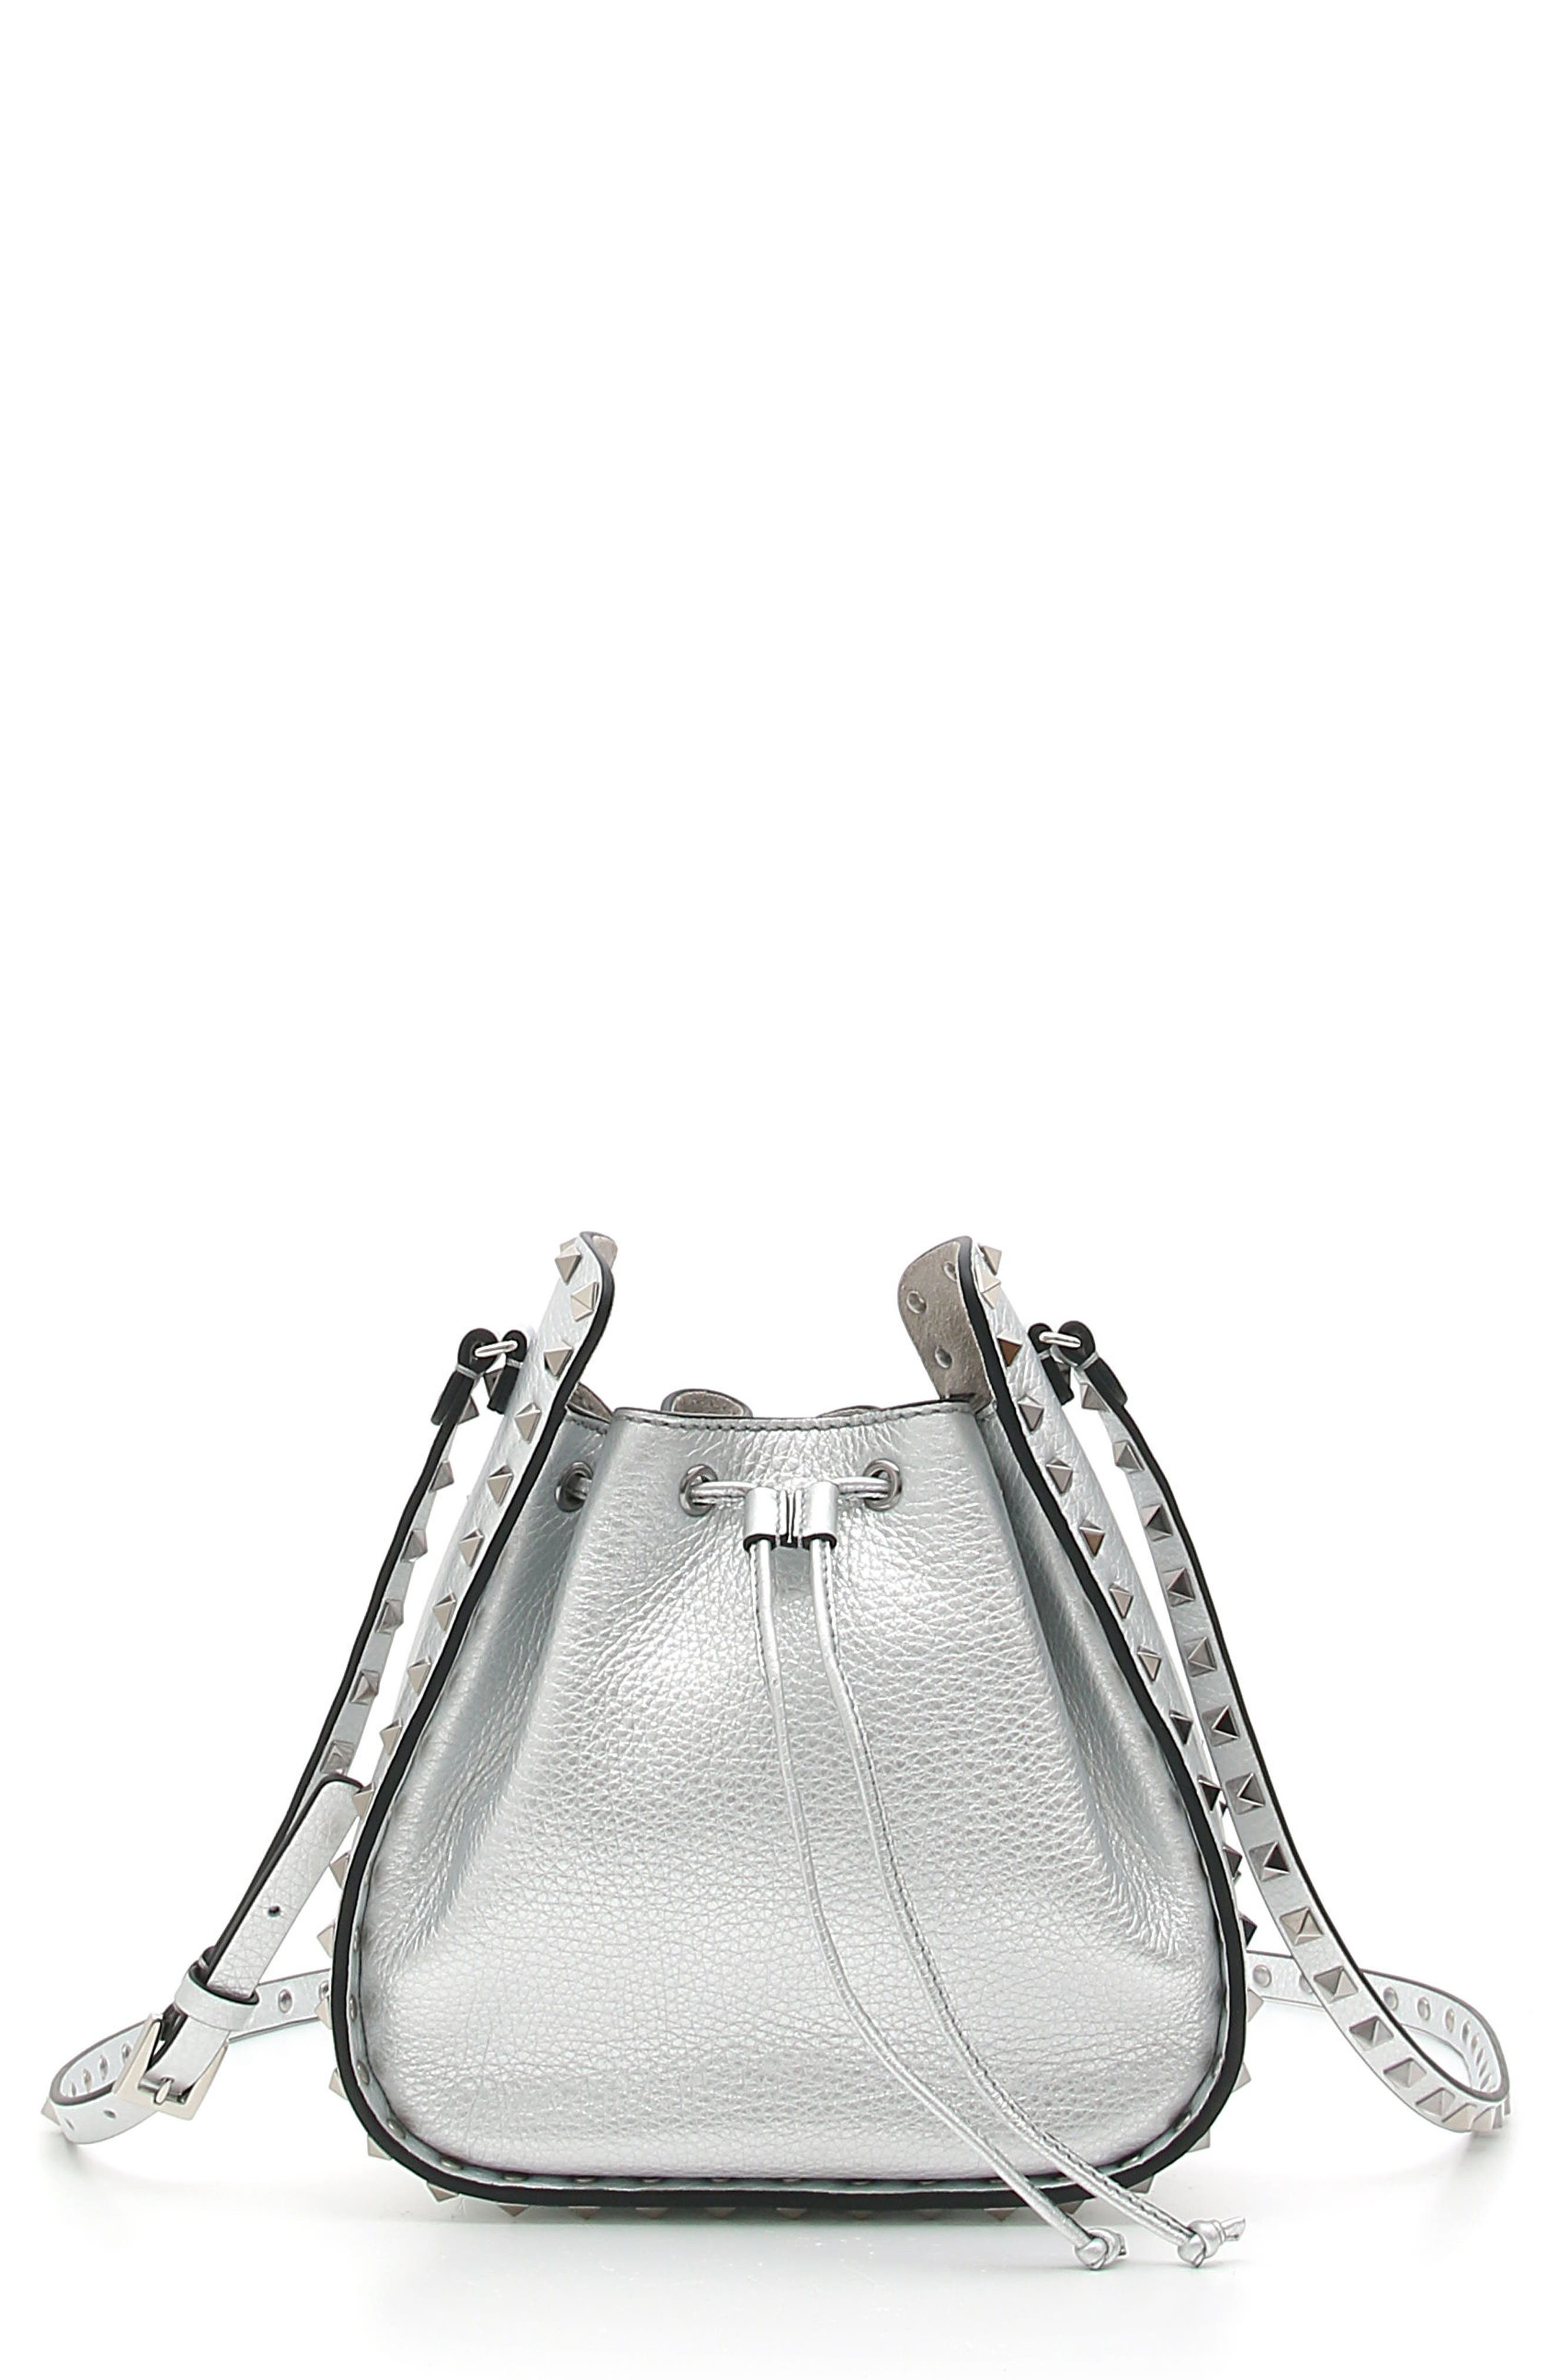 VALENTINO GARAVANI Rockstud Metallic Leather Bucket Bag